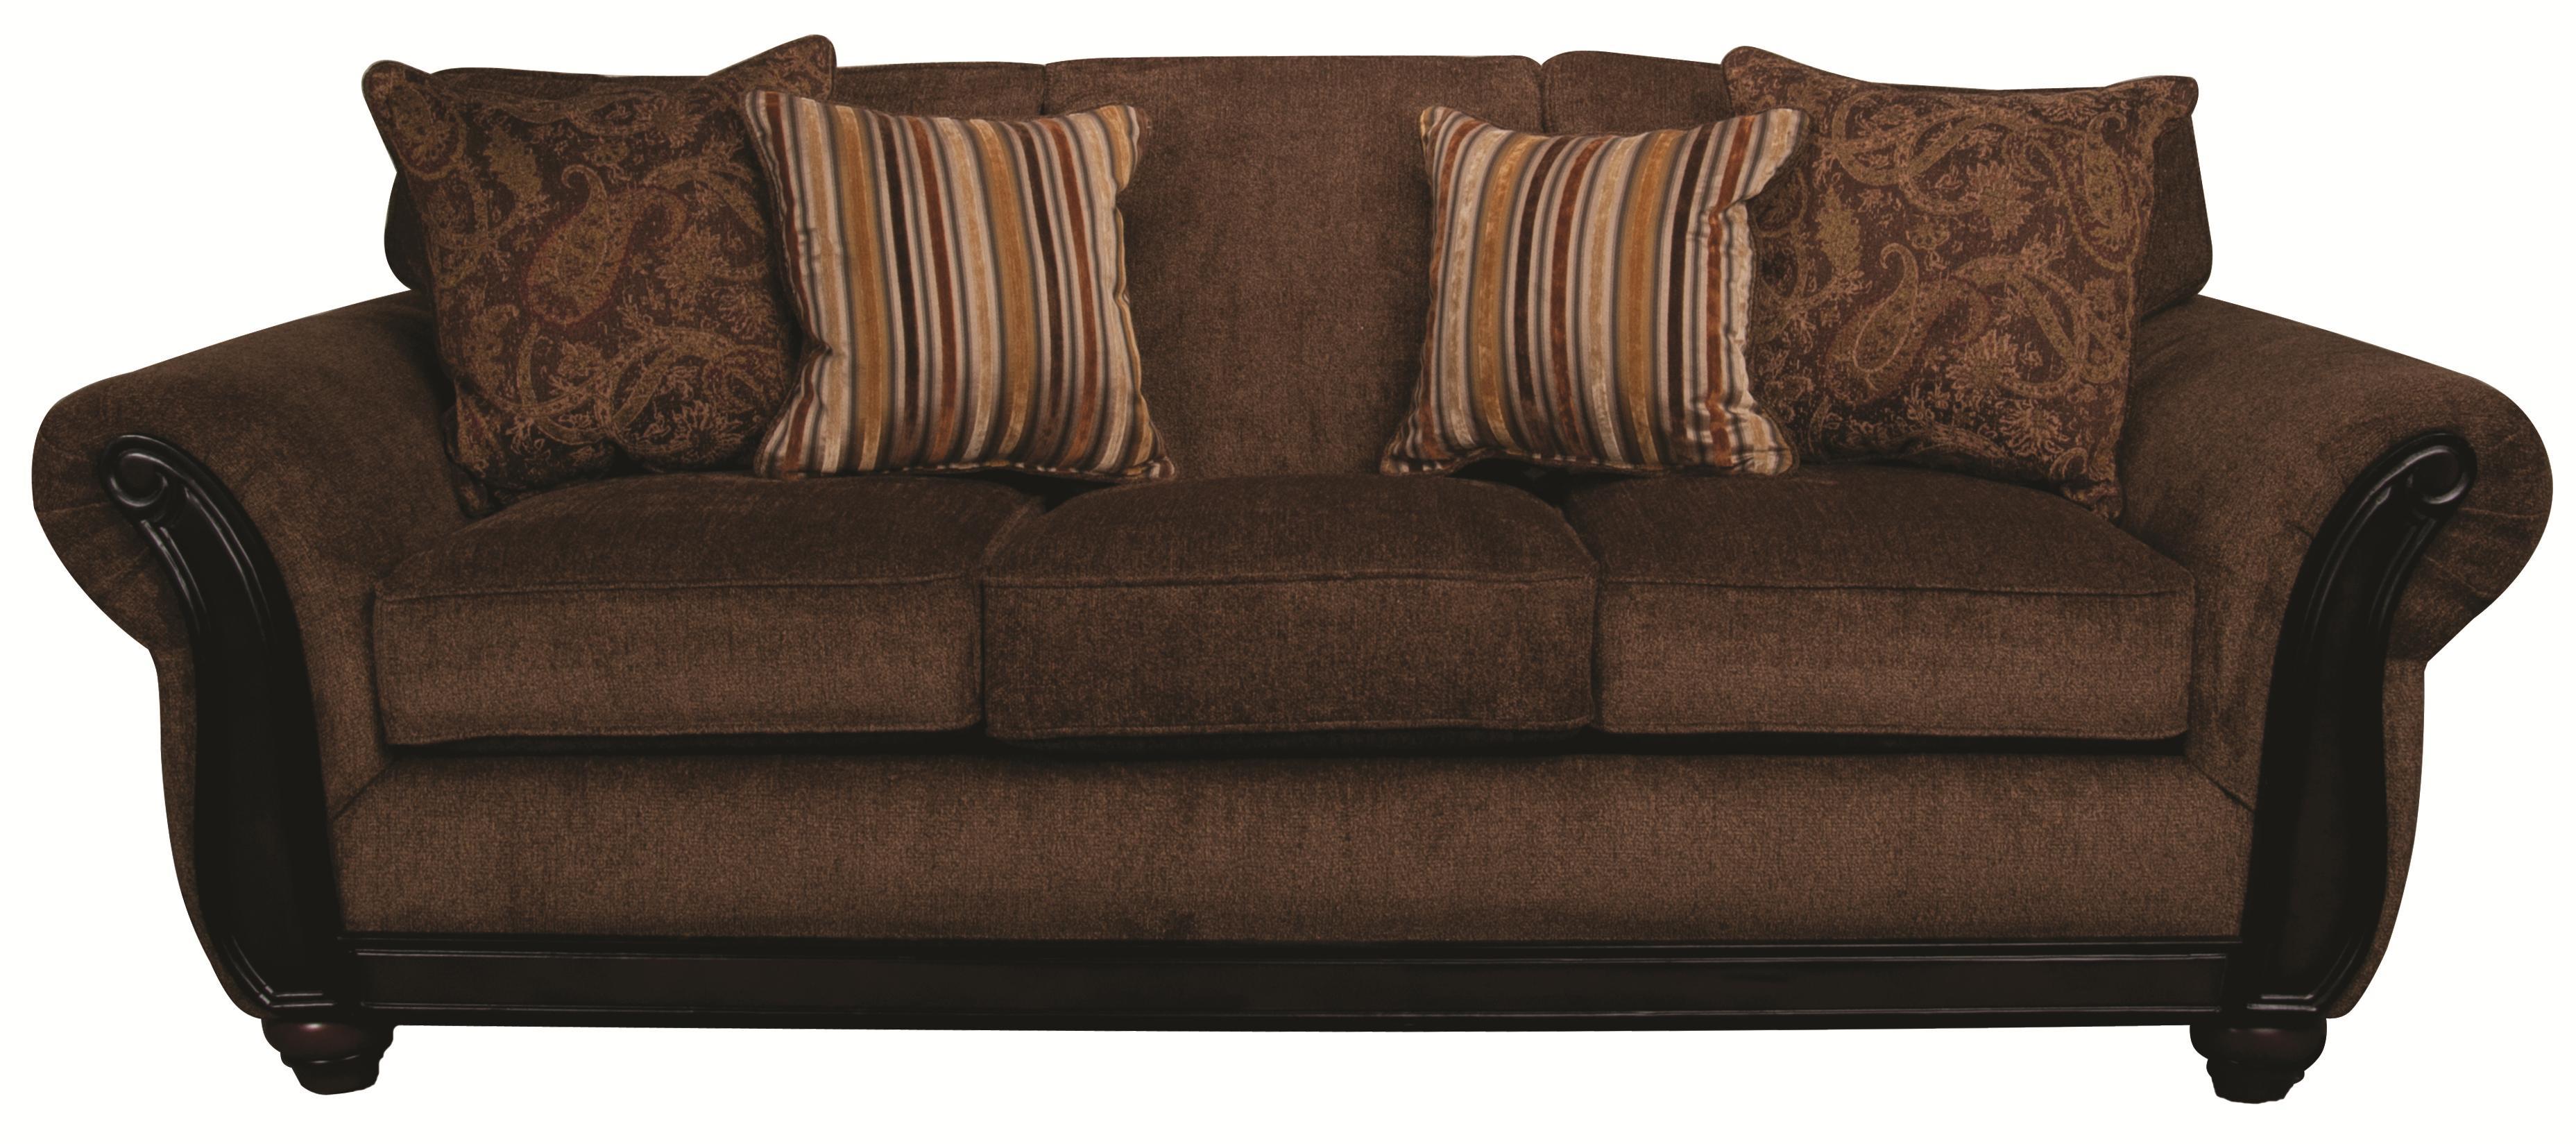 Morris Home Furnishings Samson Samson Sofa - Item Number: 630060499